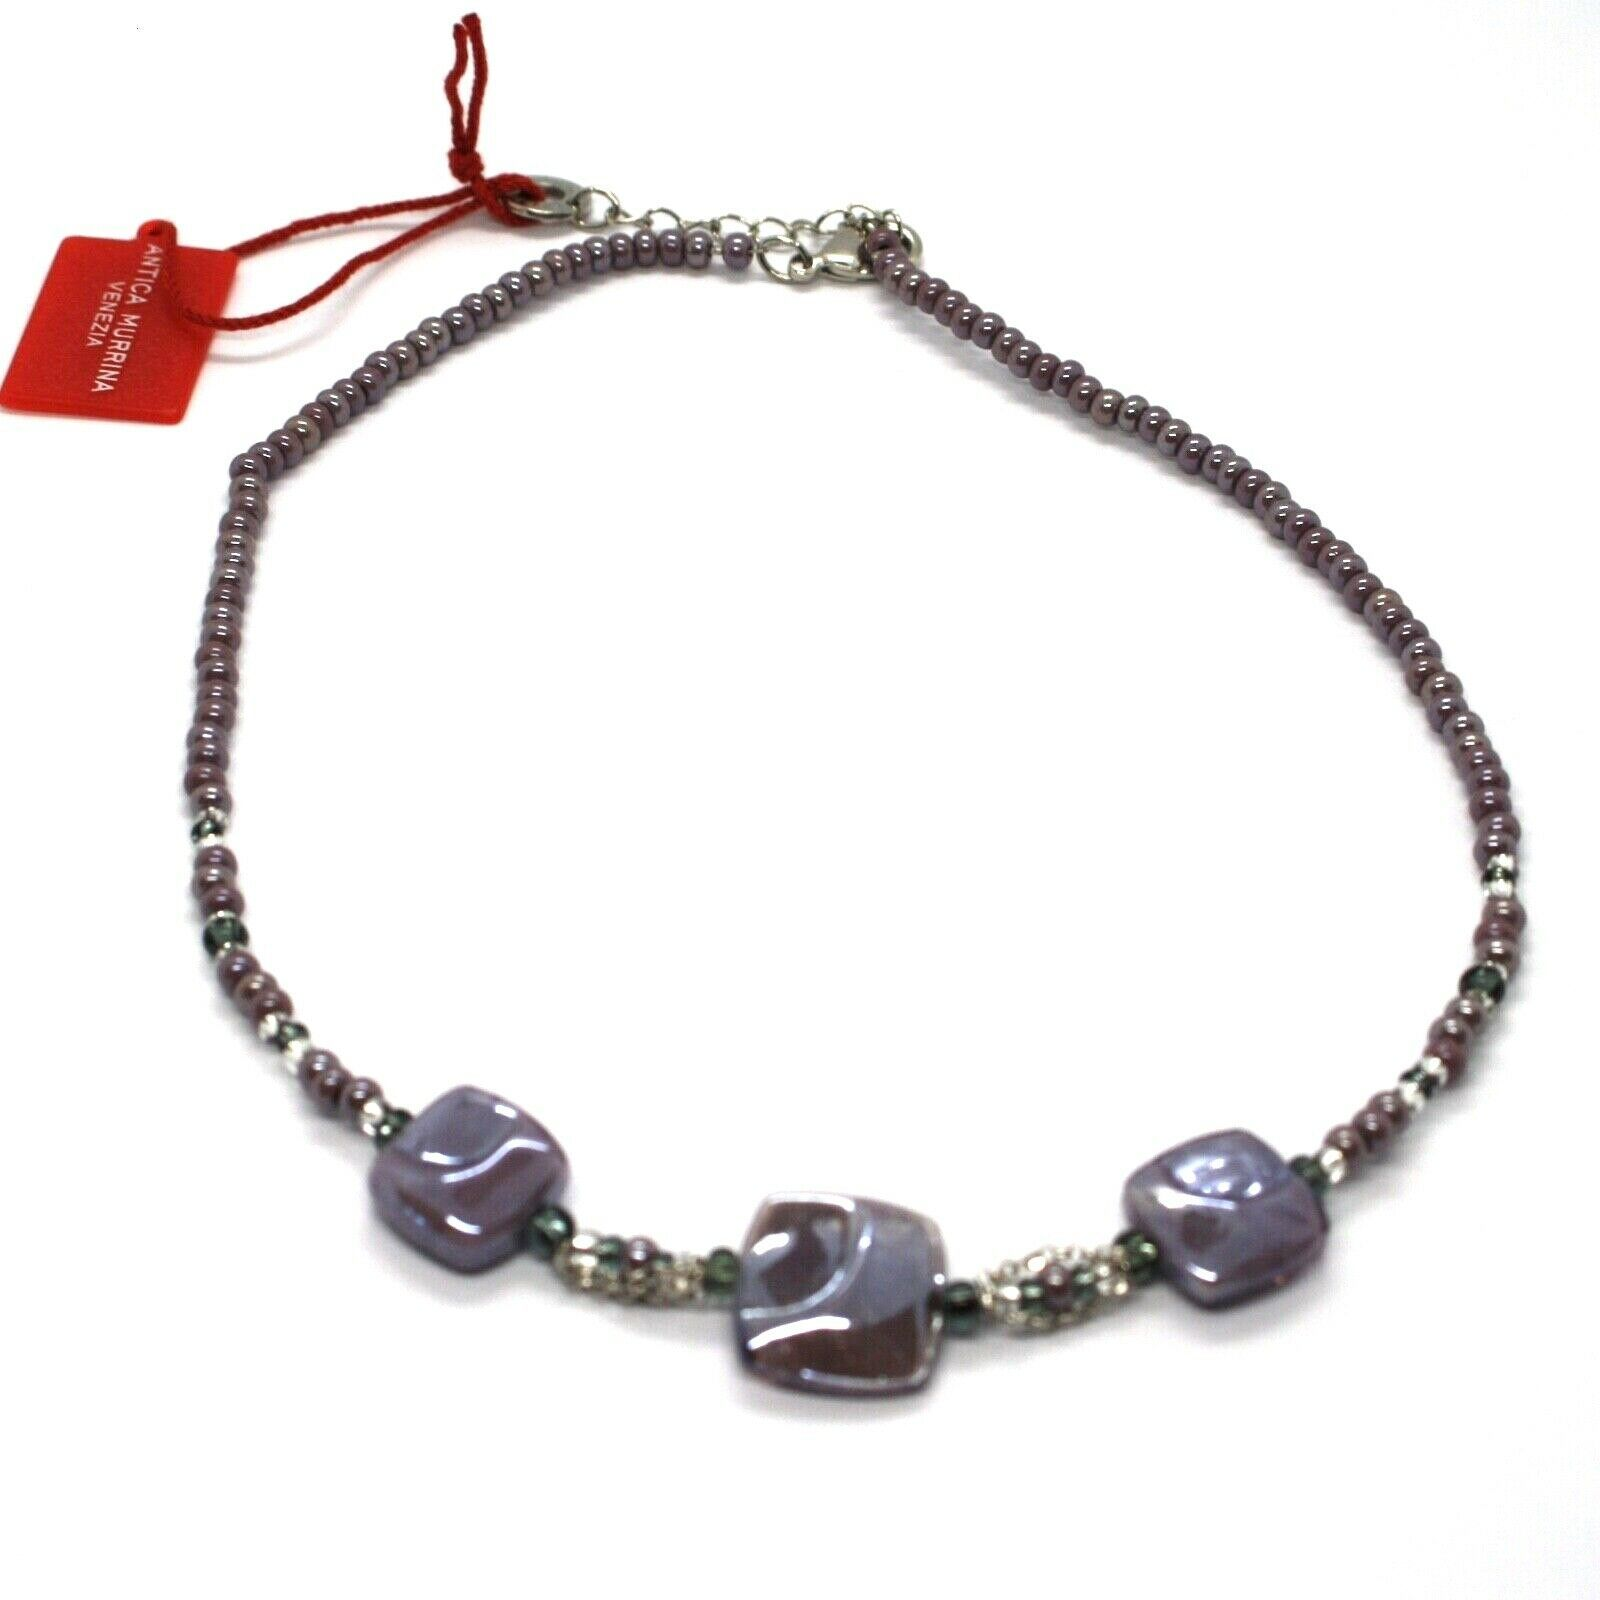 Necklace Antique Murrina Corner CO990A04 with Murano Glass Purple Choker